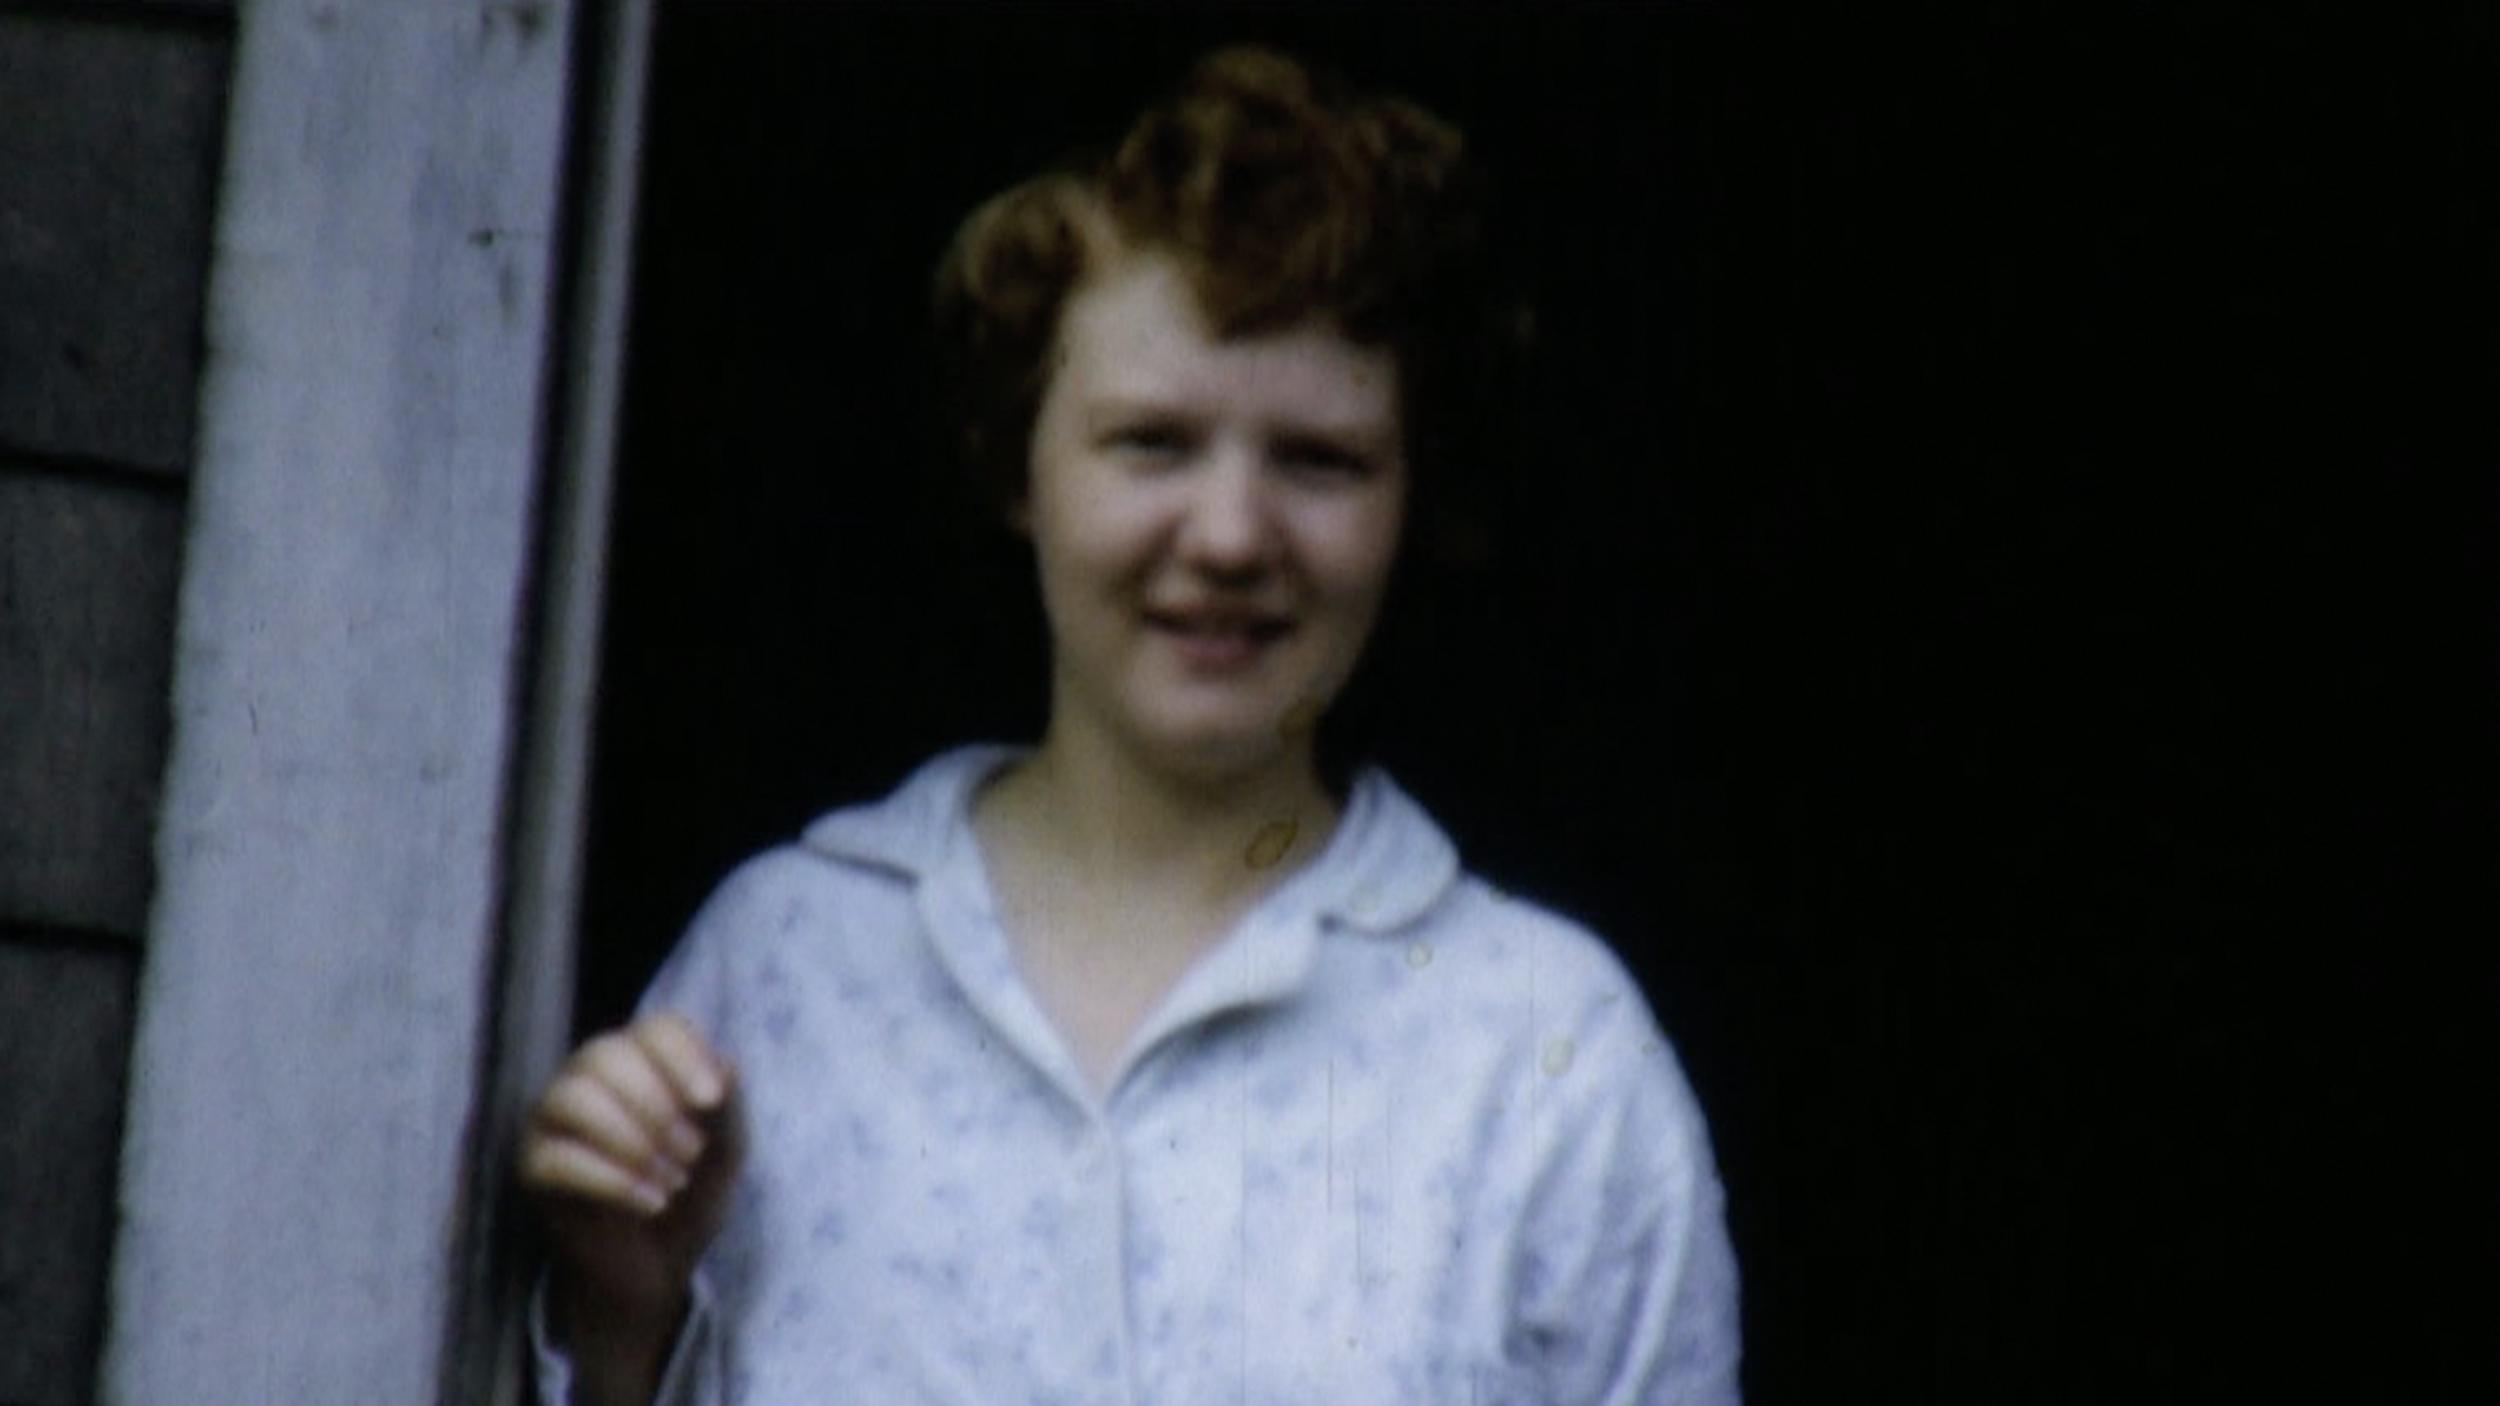 'Phyllis Dunlap' - short documentary